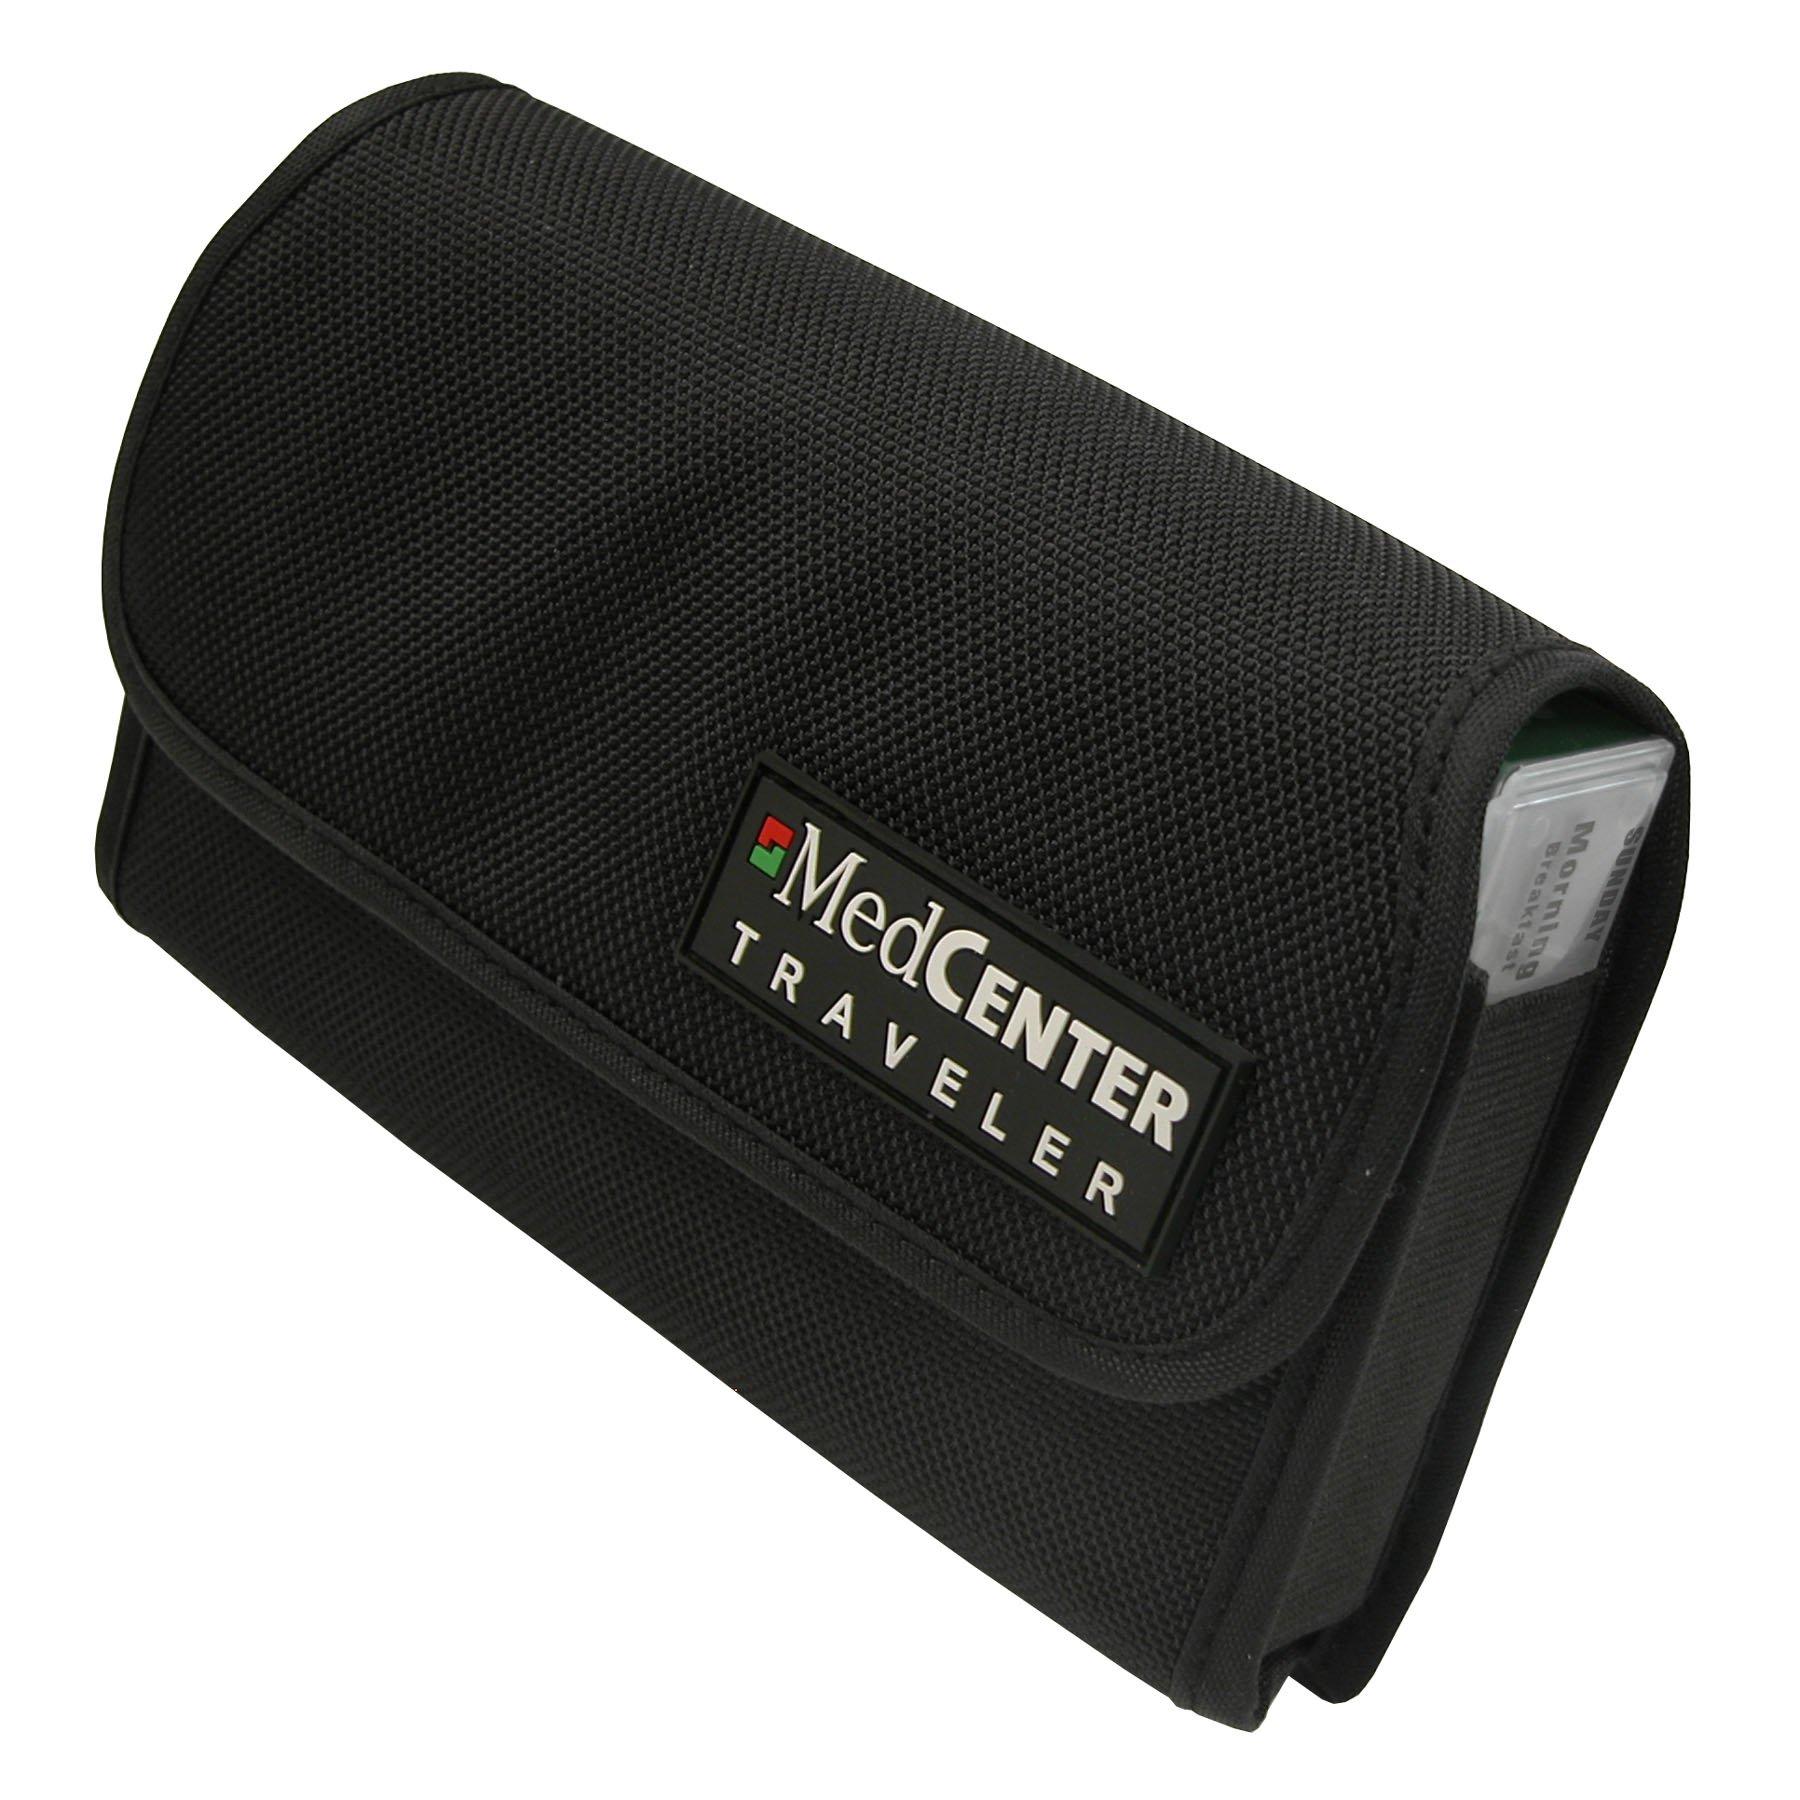 MedCenter 7 Day Traveler